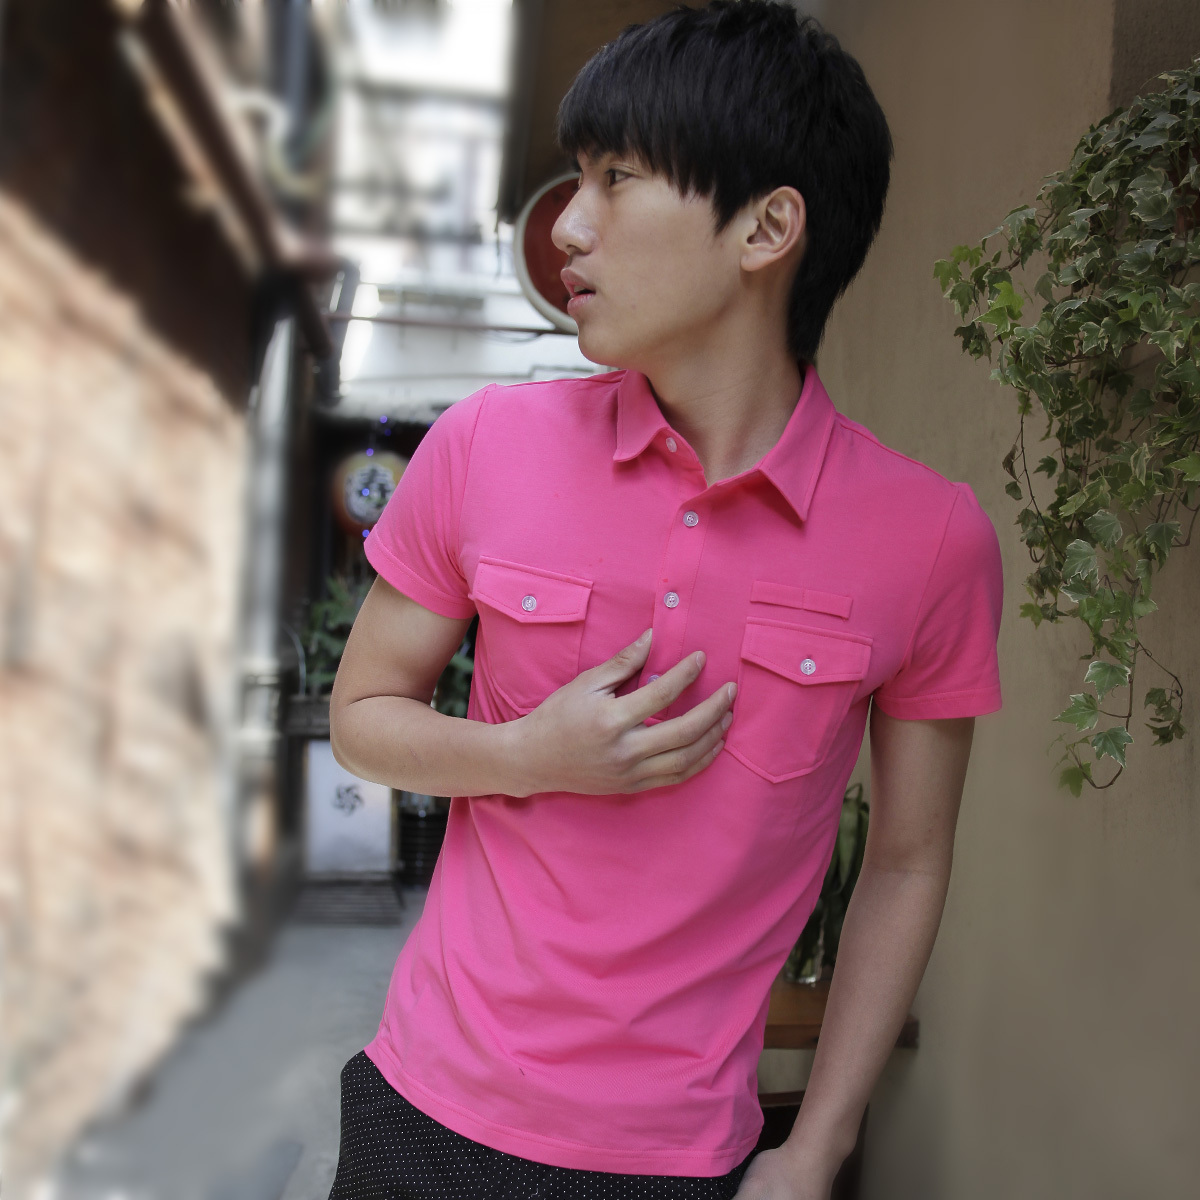 Рубашка поло Owenwong wu21b070 POLO B070 Однотонный цвет Лето 2012 Классический рукав Короткие рукава (длина рукава <35см)